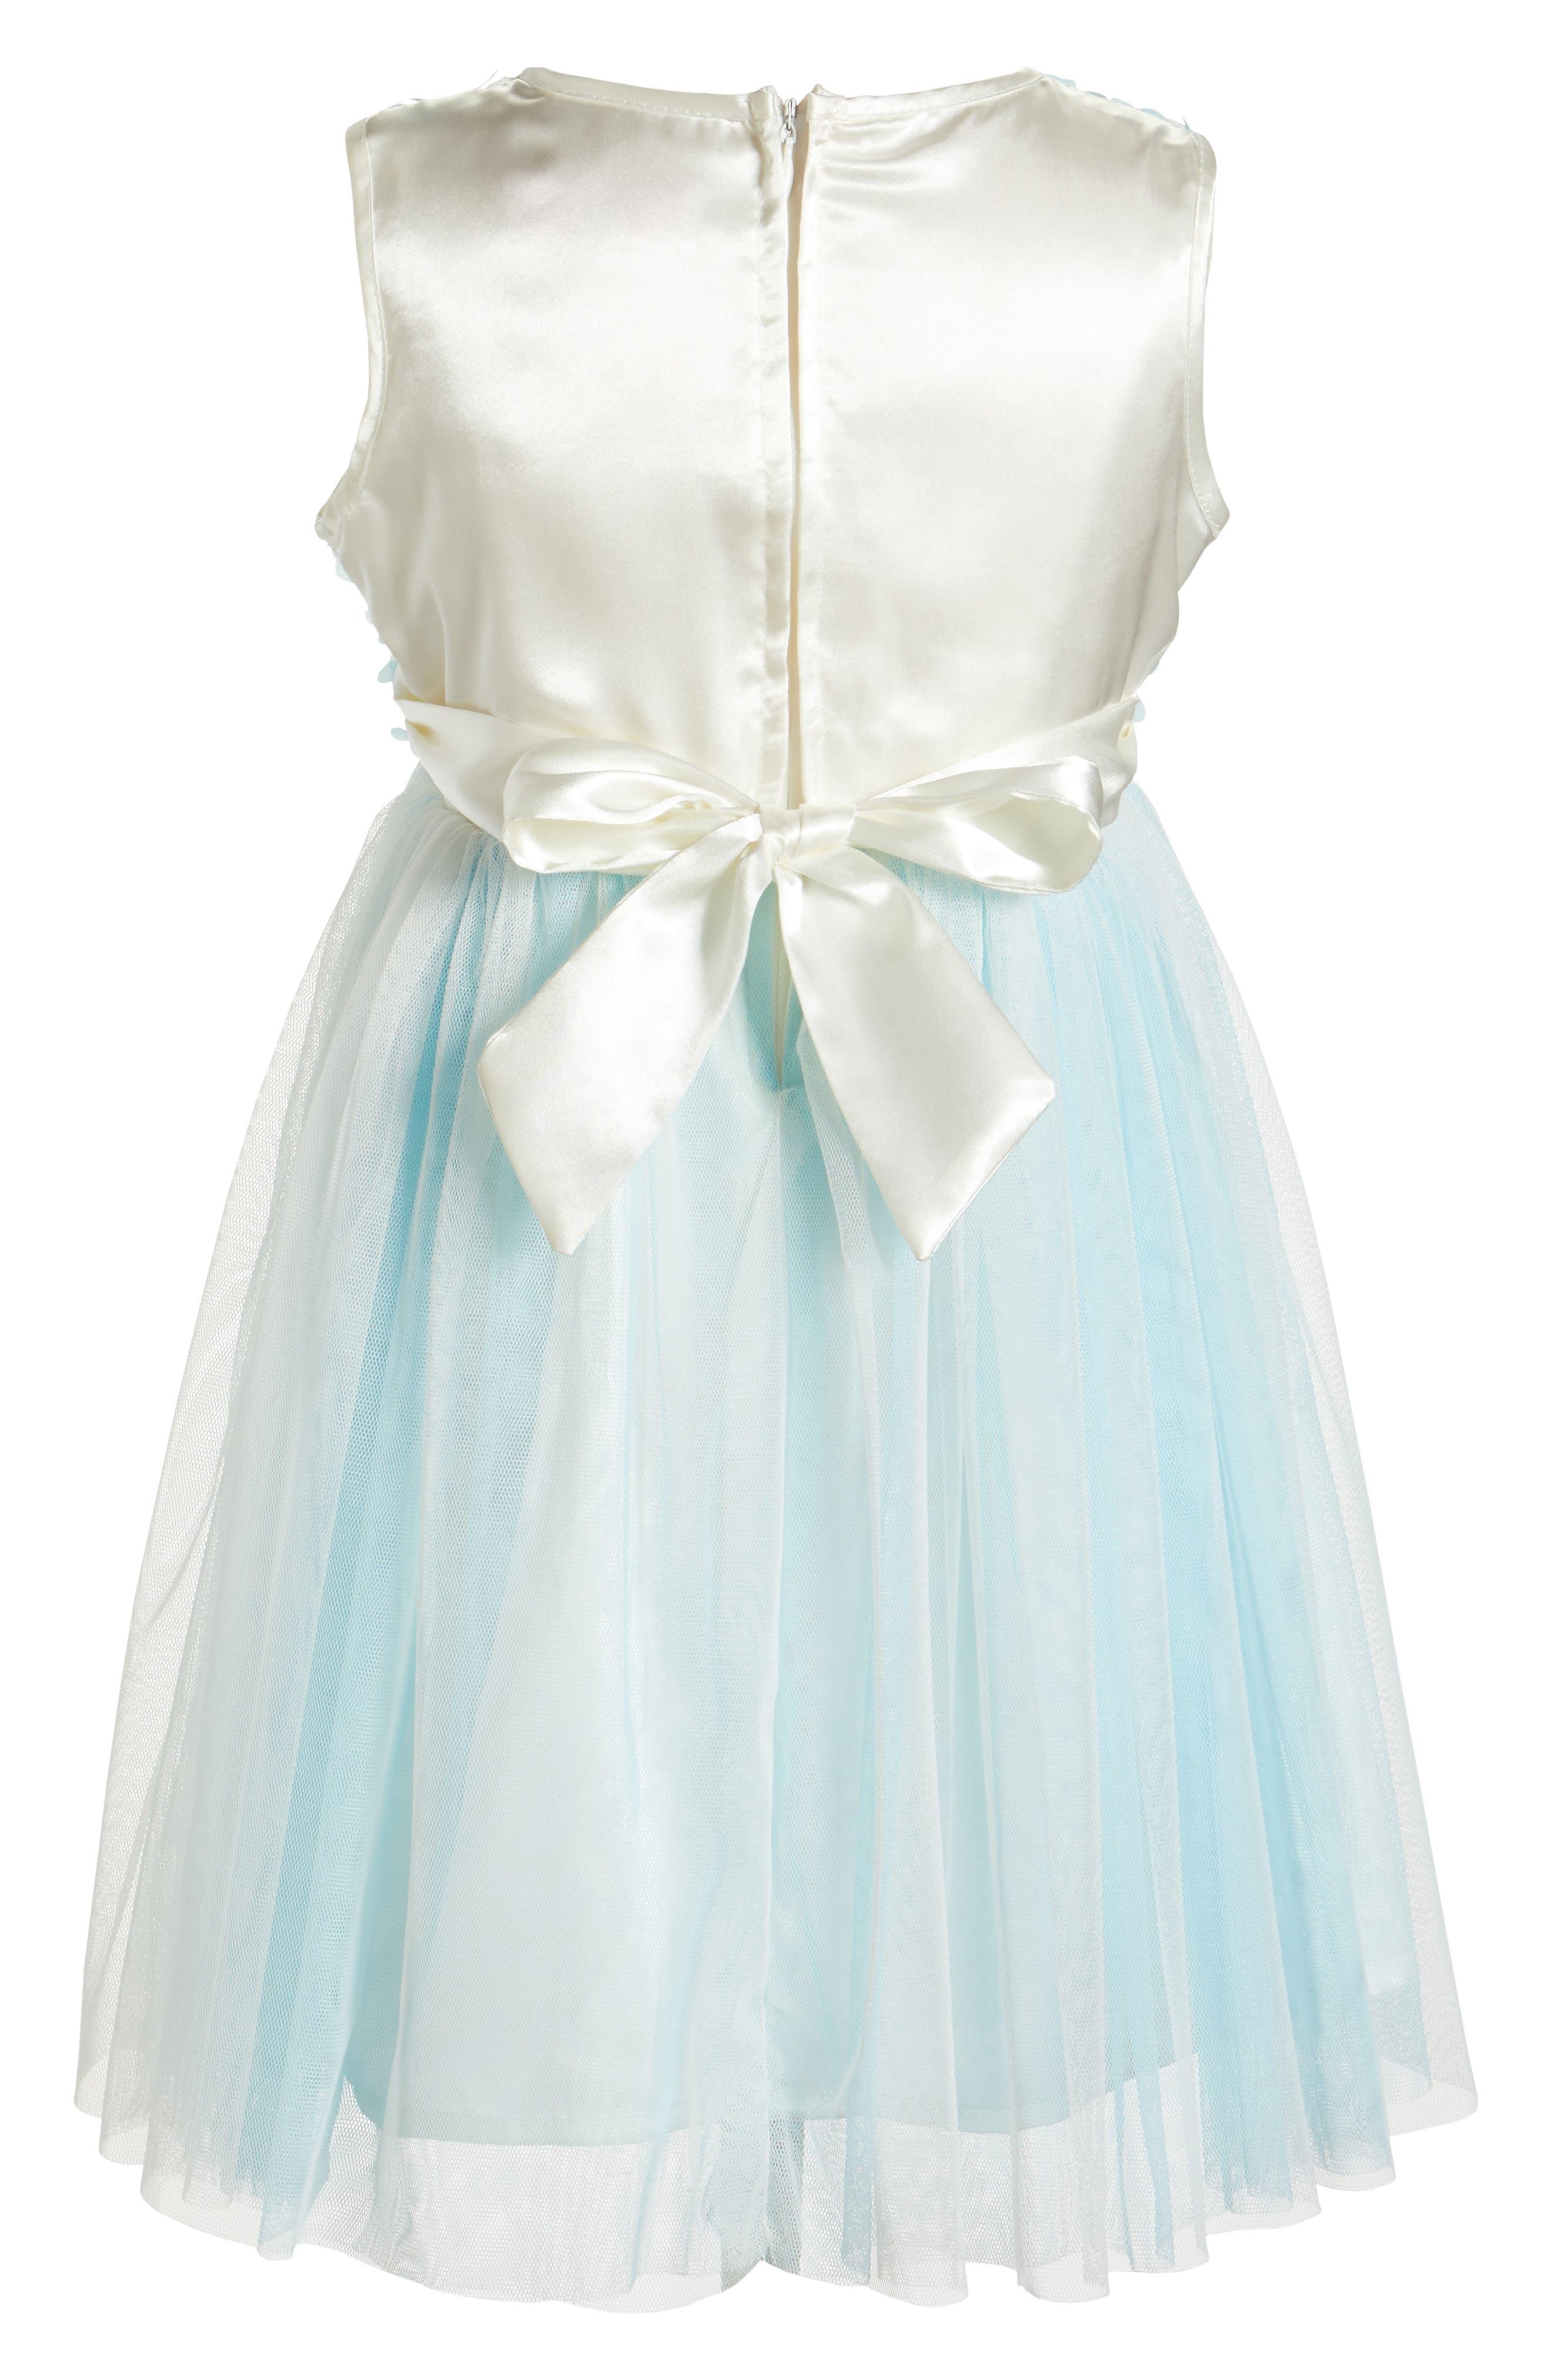 Sleeveless Floral Dress,                             Alternate thumbnail 2, color,                             BLUE